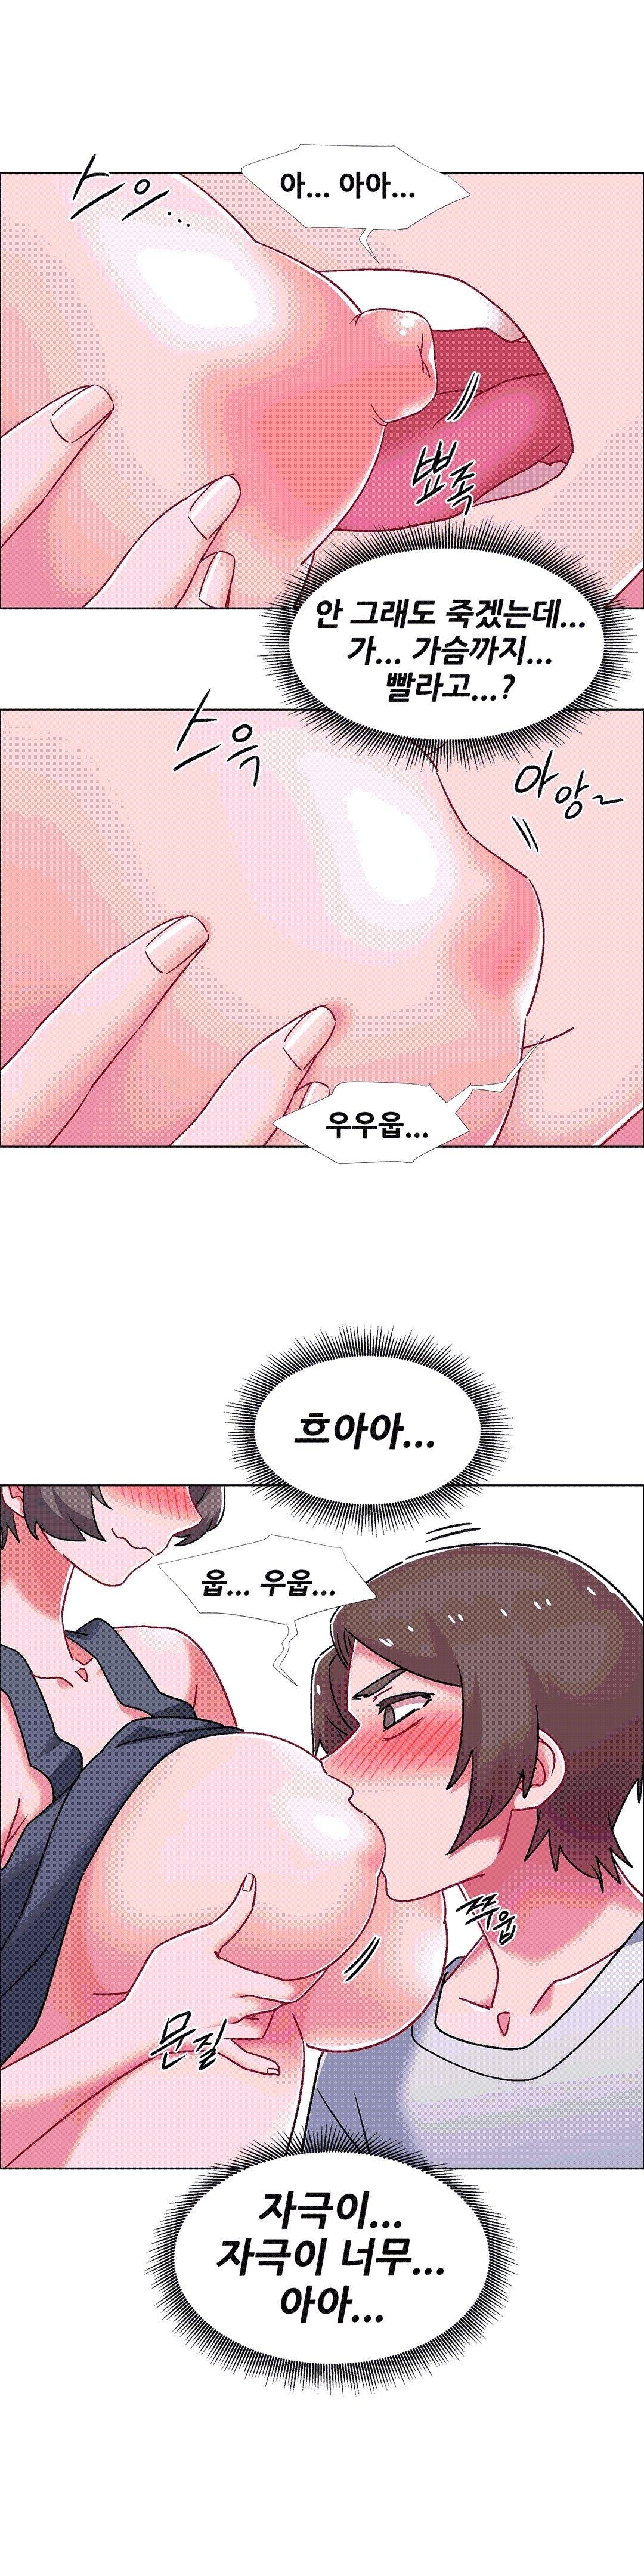 [Studio Wannabe] Rental Girls | 出租女郎 Ch. 33-58 [Chinese]  第二季 完结 592